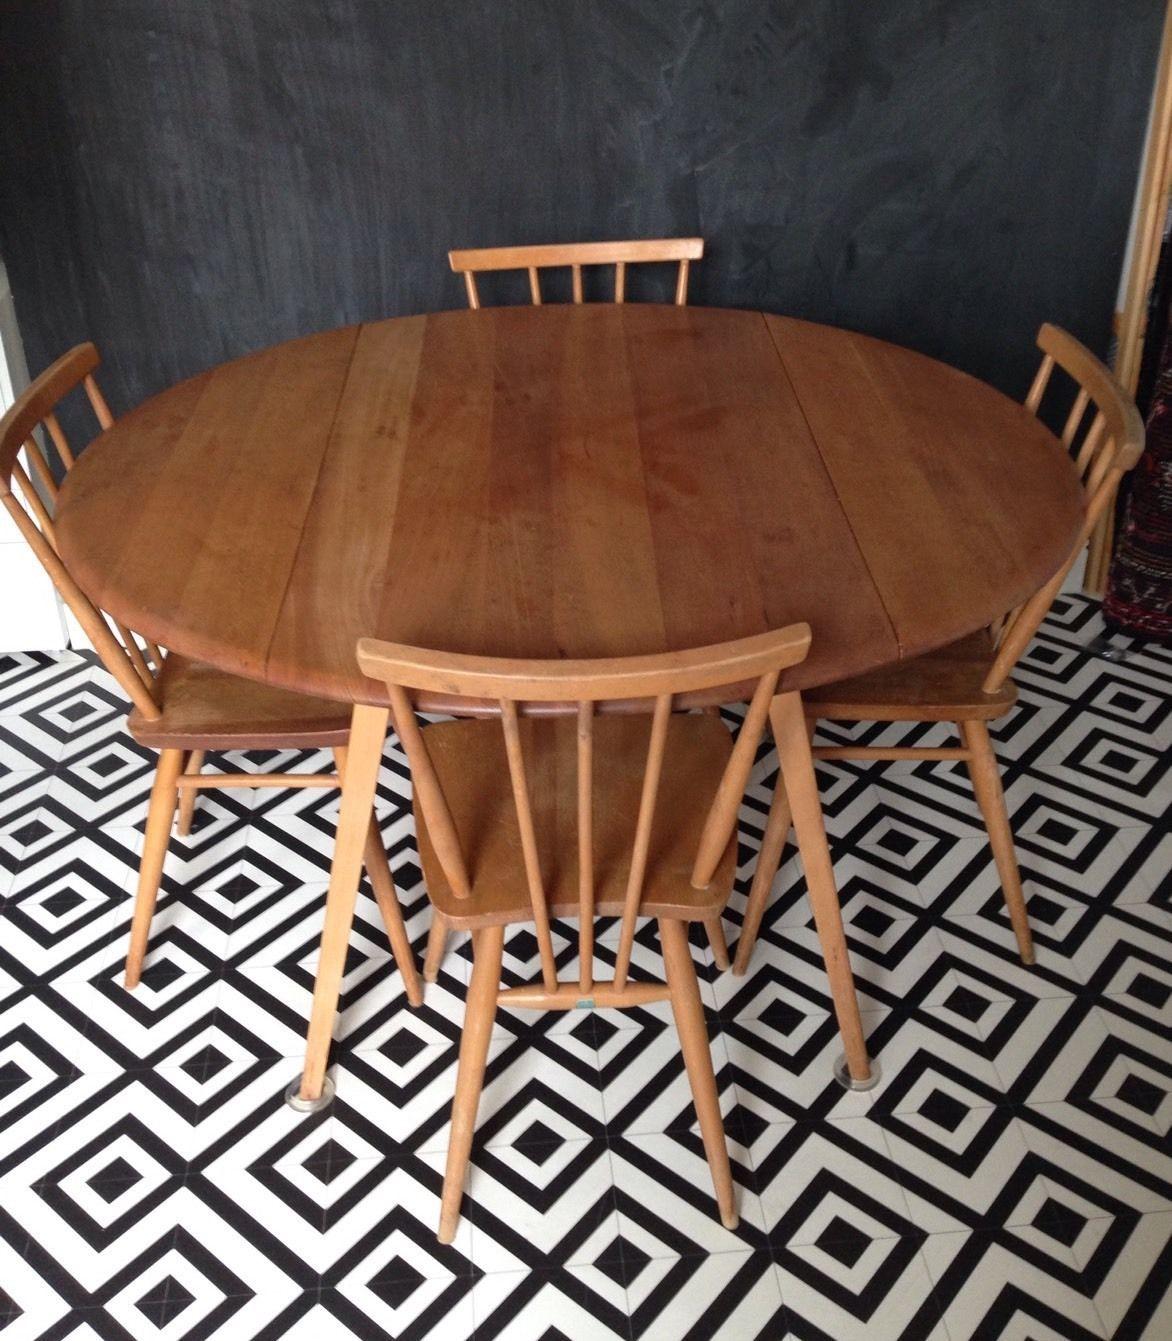 Phenomenal Ercol Blonde Round Drop Leaf Dining Table 384 2 Windsor Download Free Architecture Designs Salvmadebymaigaardcom